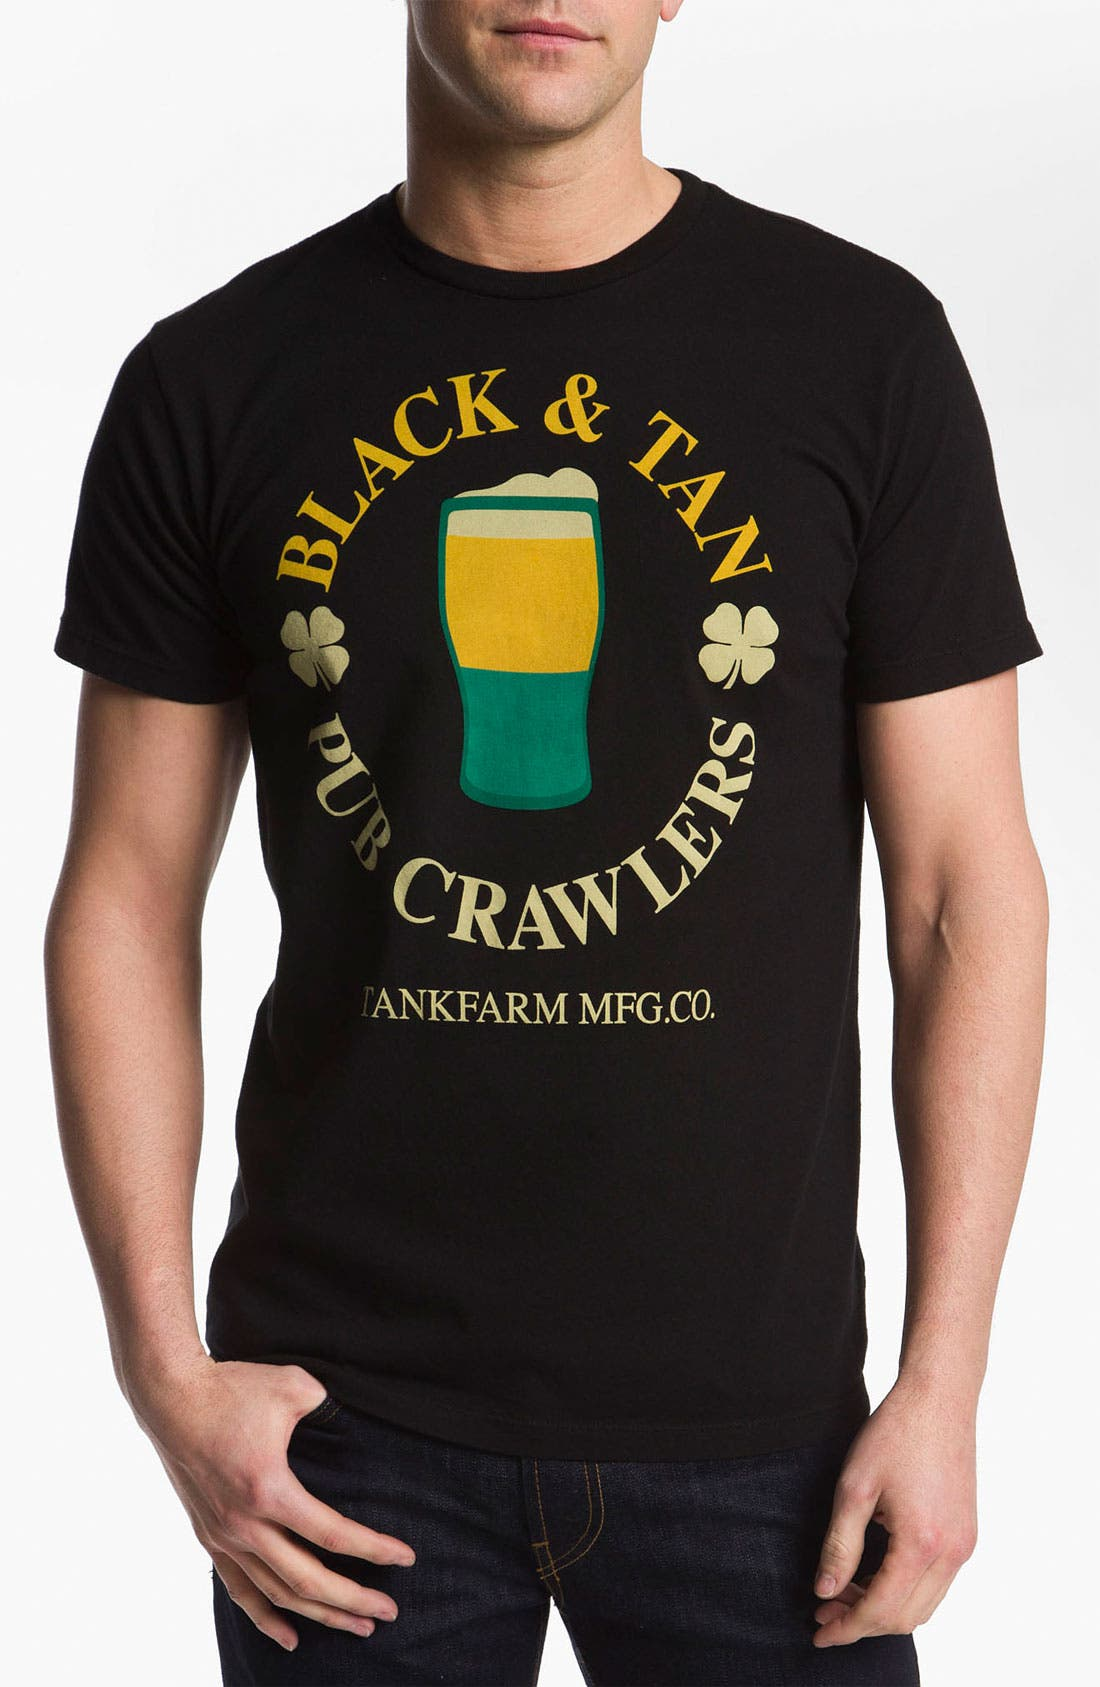 Main Image - Tankfarm 'Black & Tan' T-Shirt